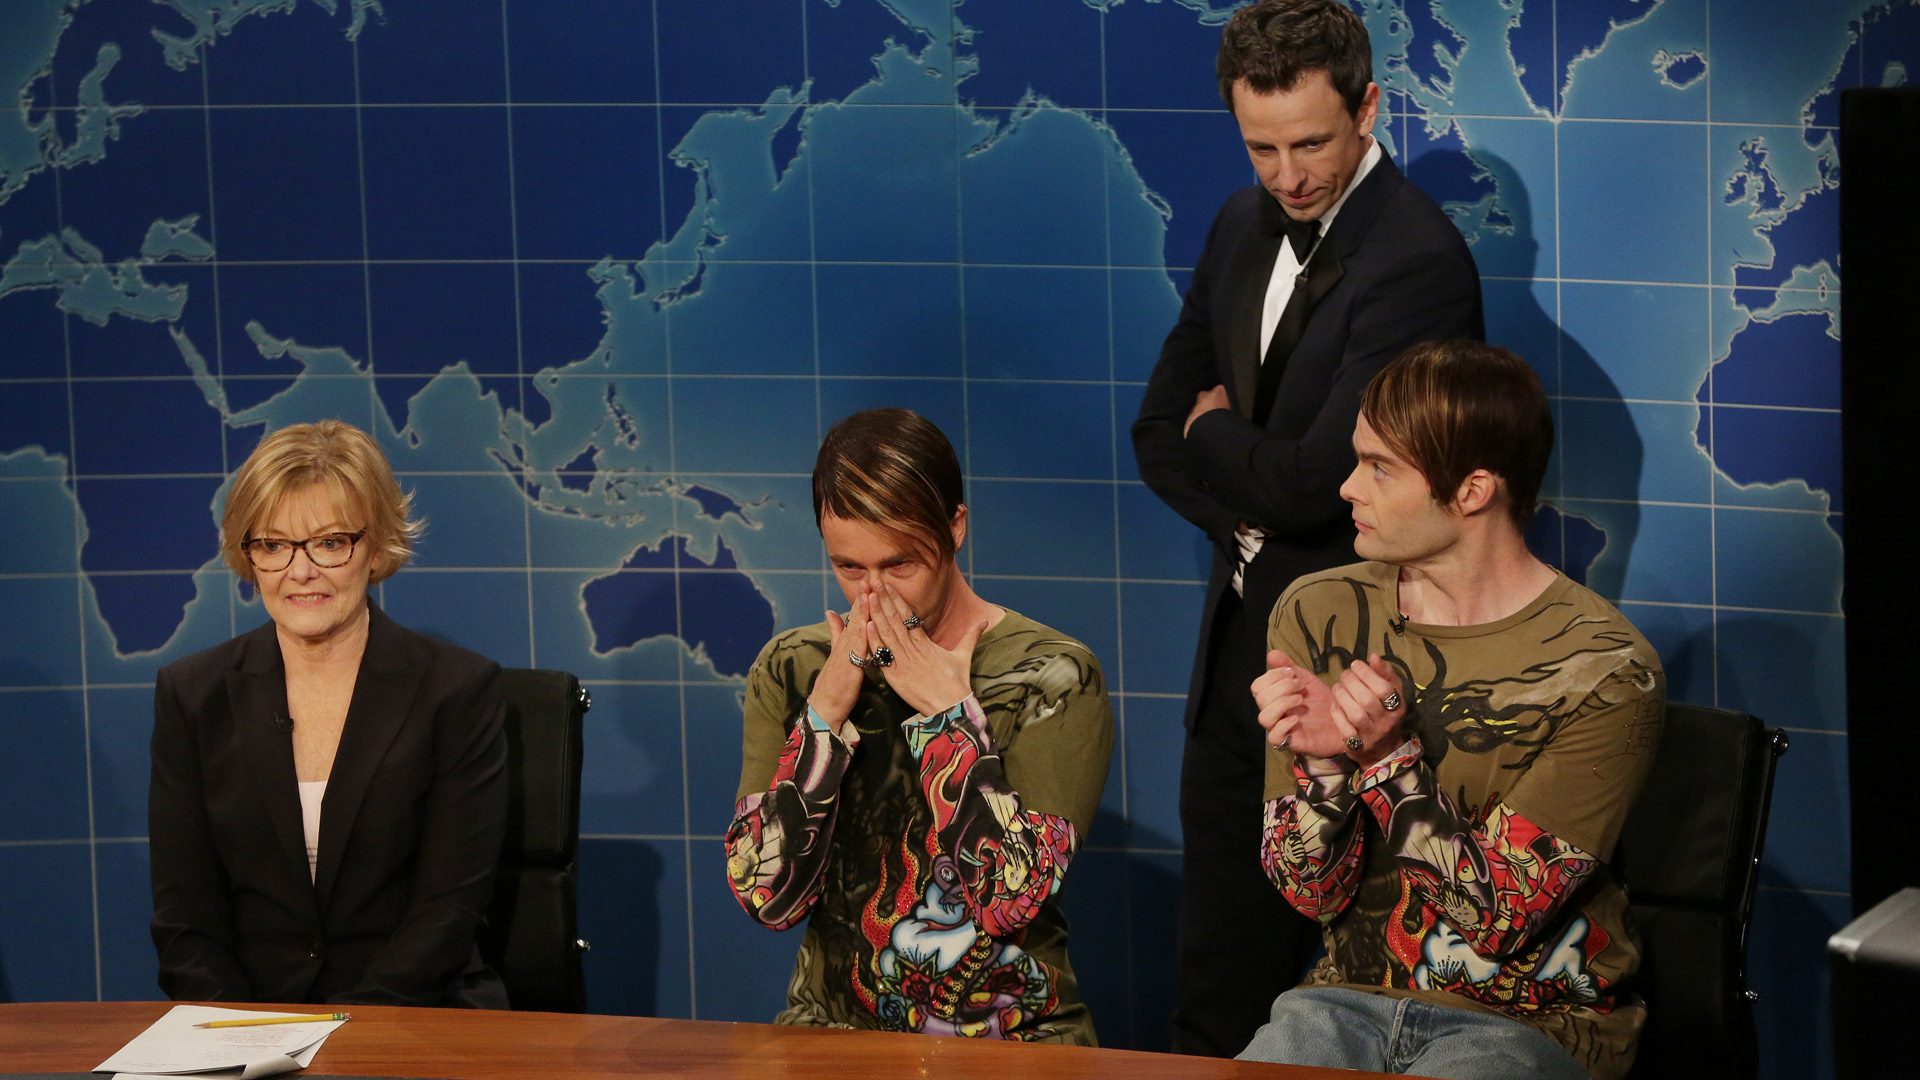 Saturday Night Live Preparing For 40th Anniversary Special